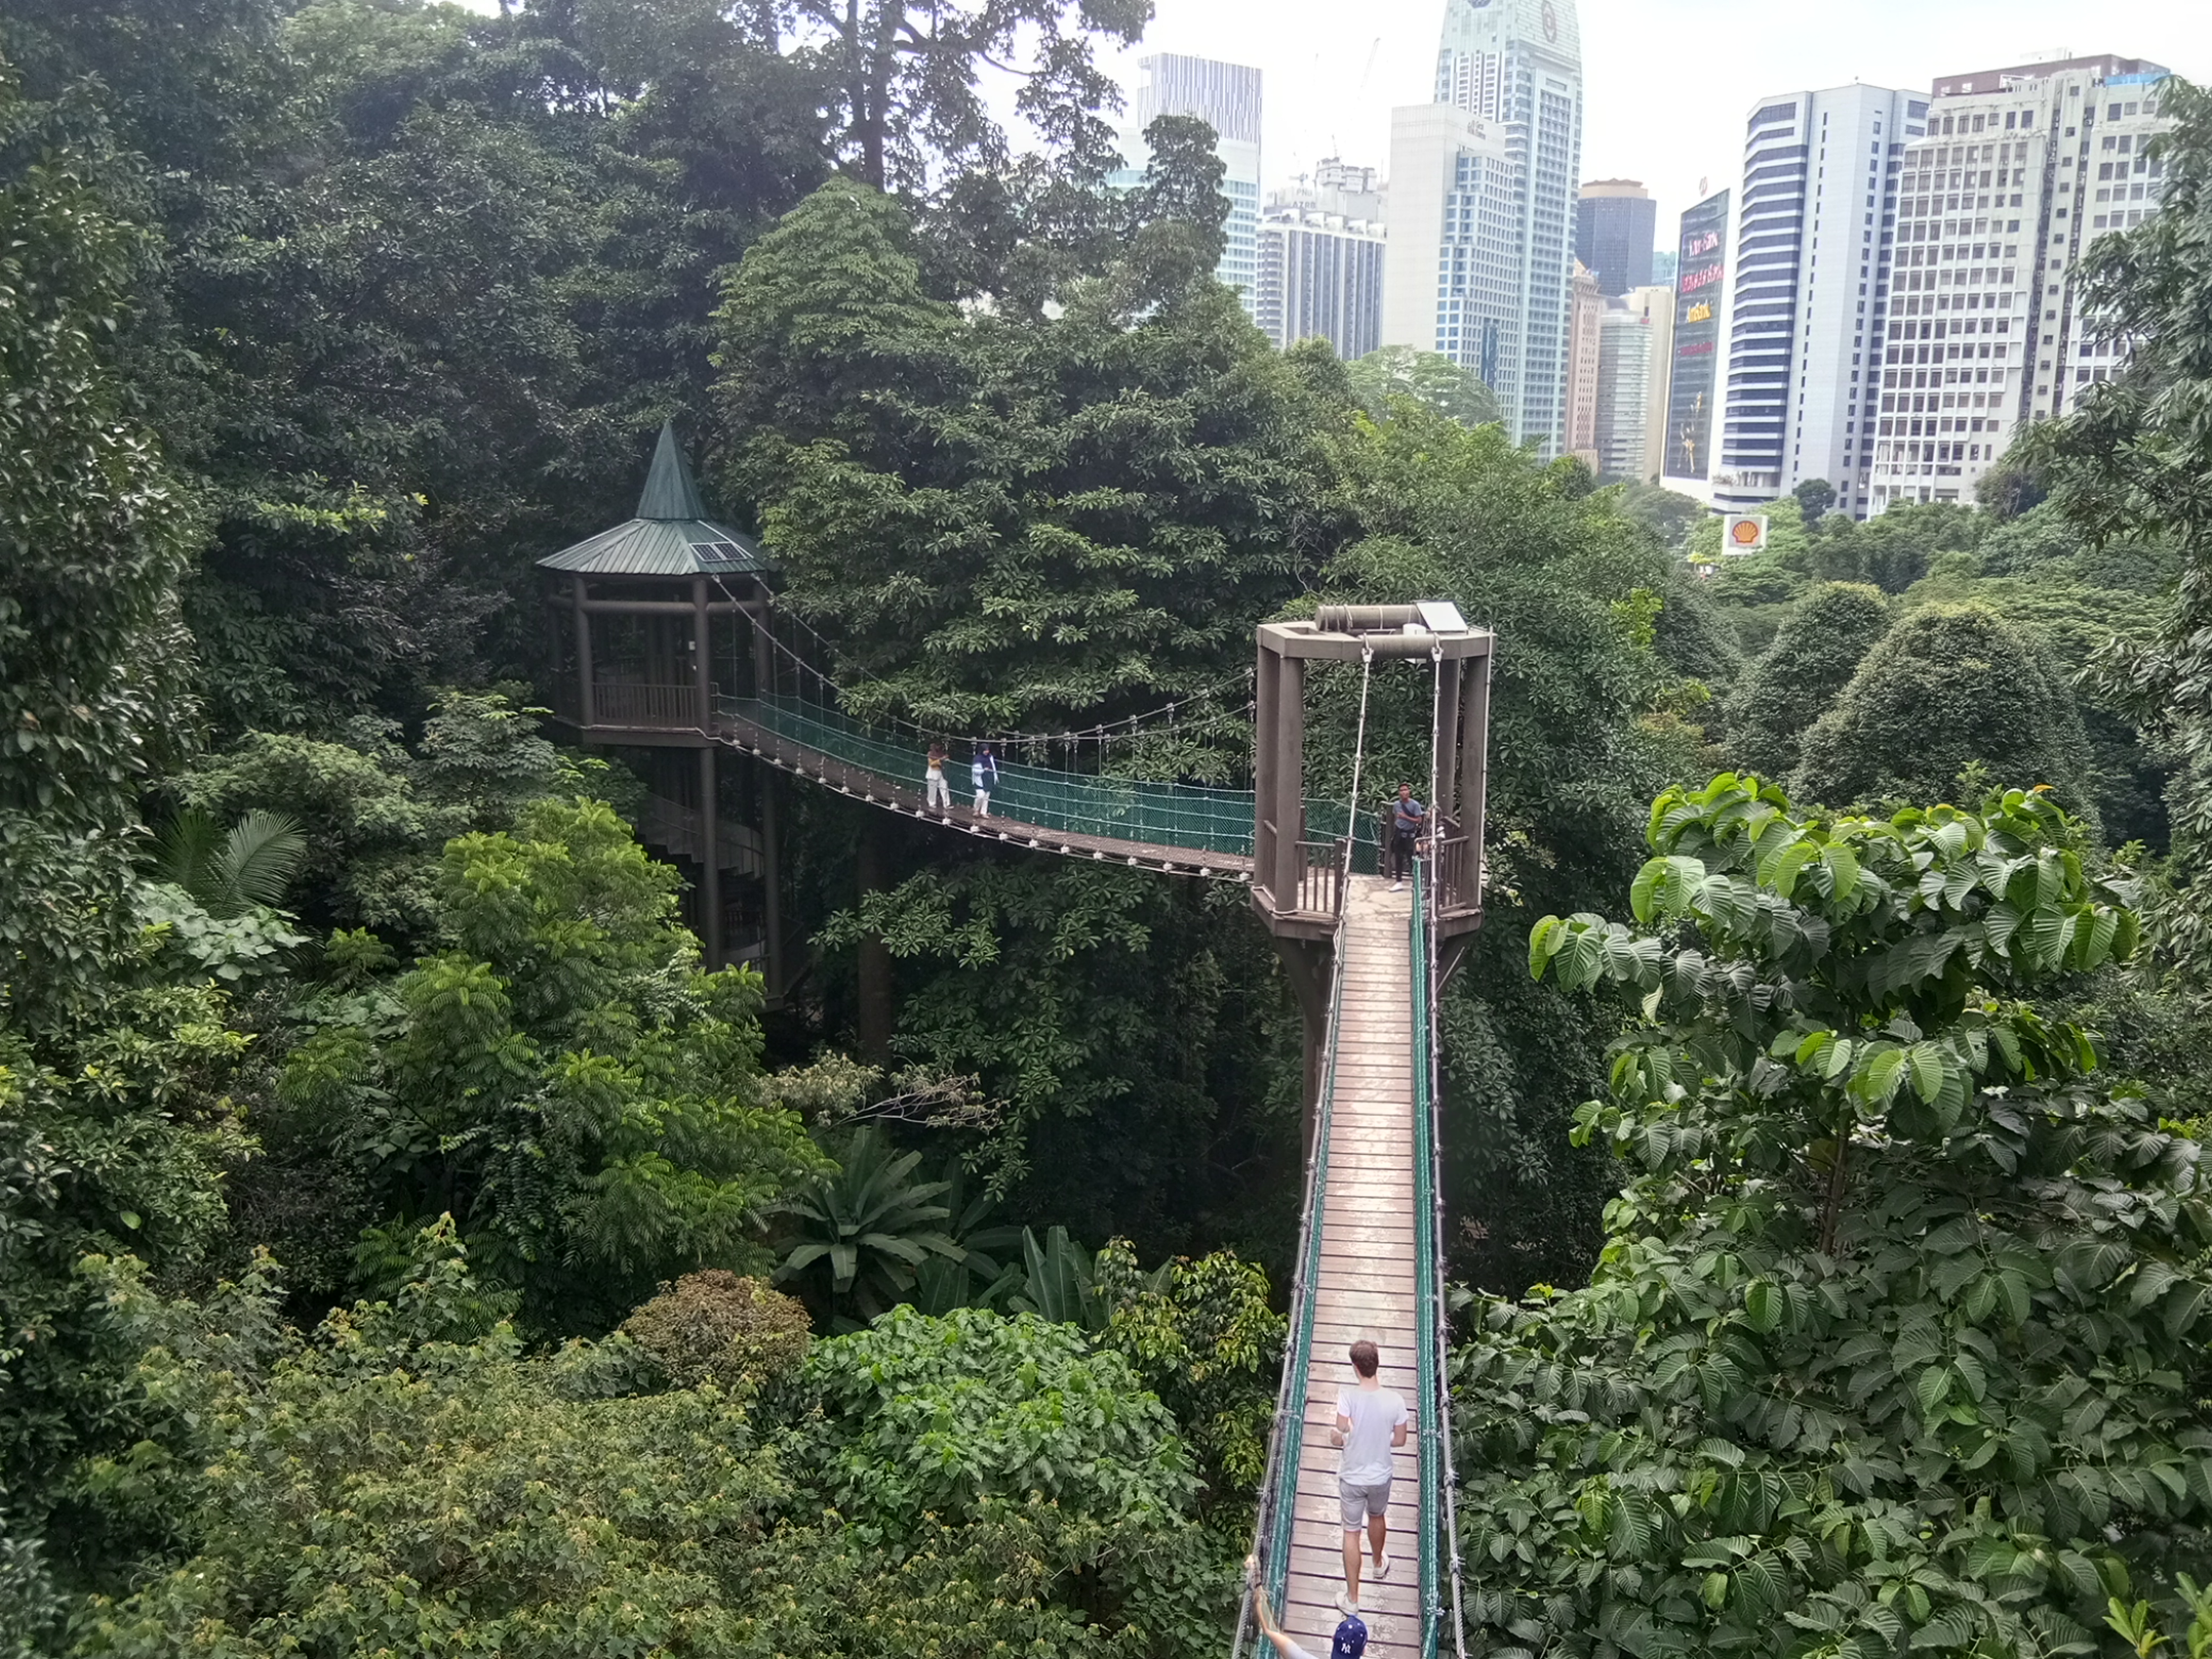 「kl forest eco park」的圖片搜尋結果